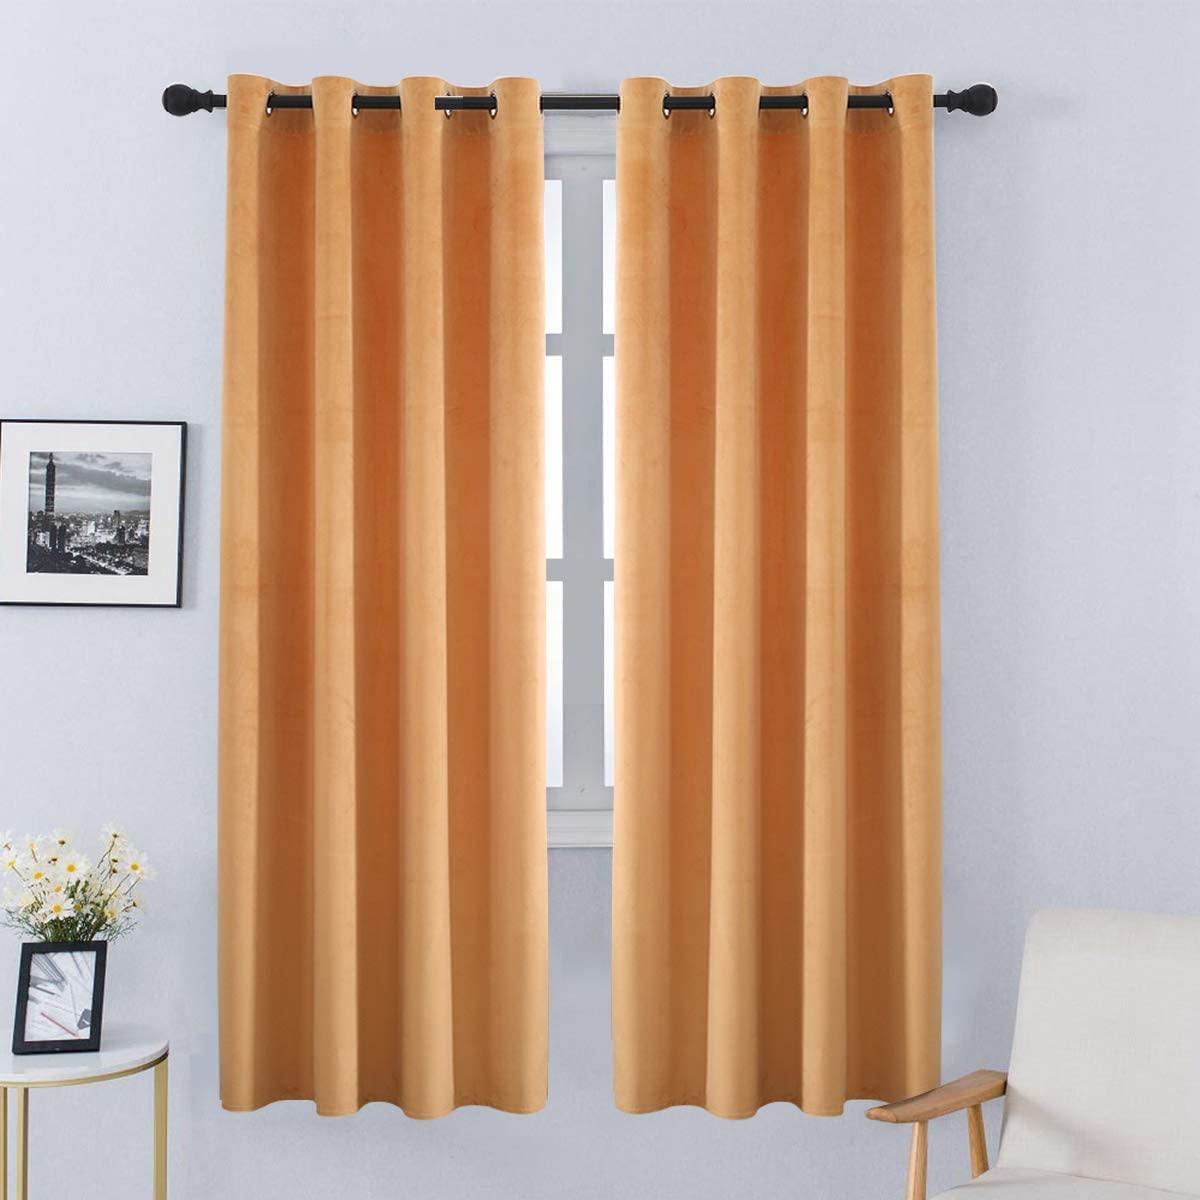 SPXTEX Orange Velvet Curtains 63 inches Length Soft Velvet Textured Curtains Velvet Thermal Curtains Window Treatment for Bedroom Light Filtering Velvet Curtain Panels Set of 2 Panels Orange